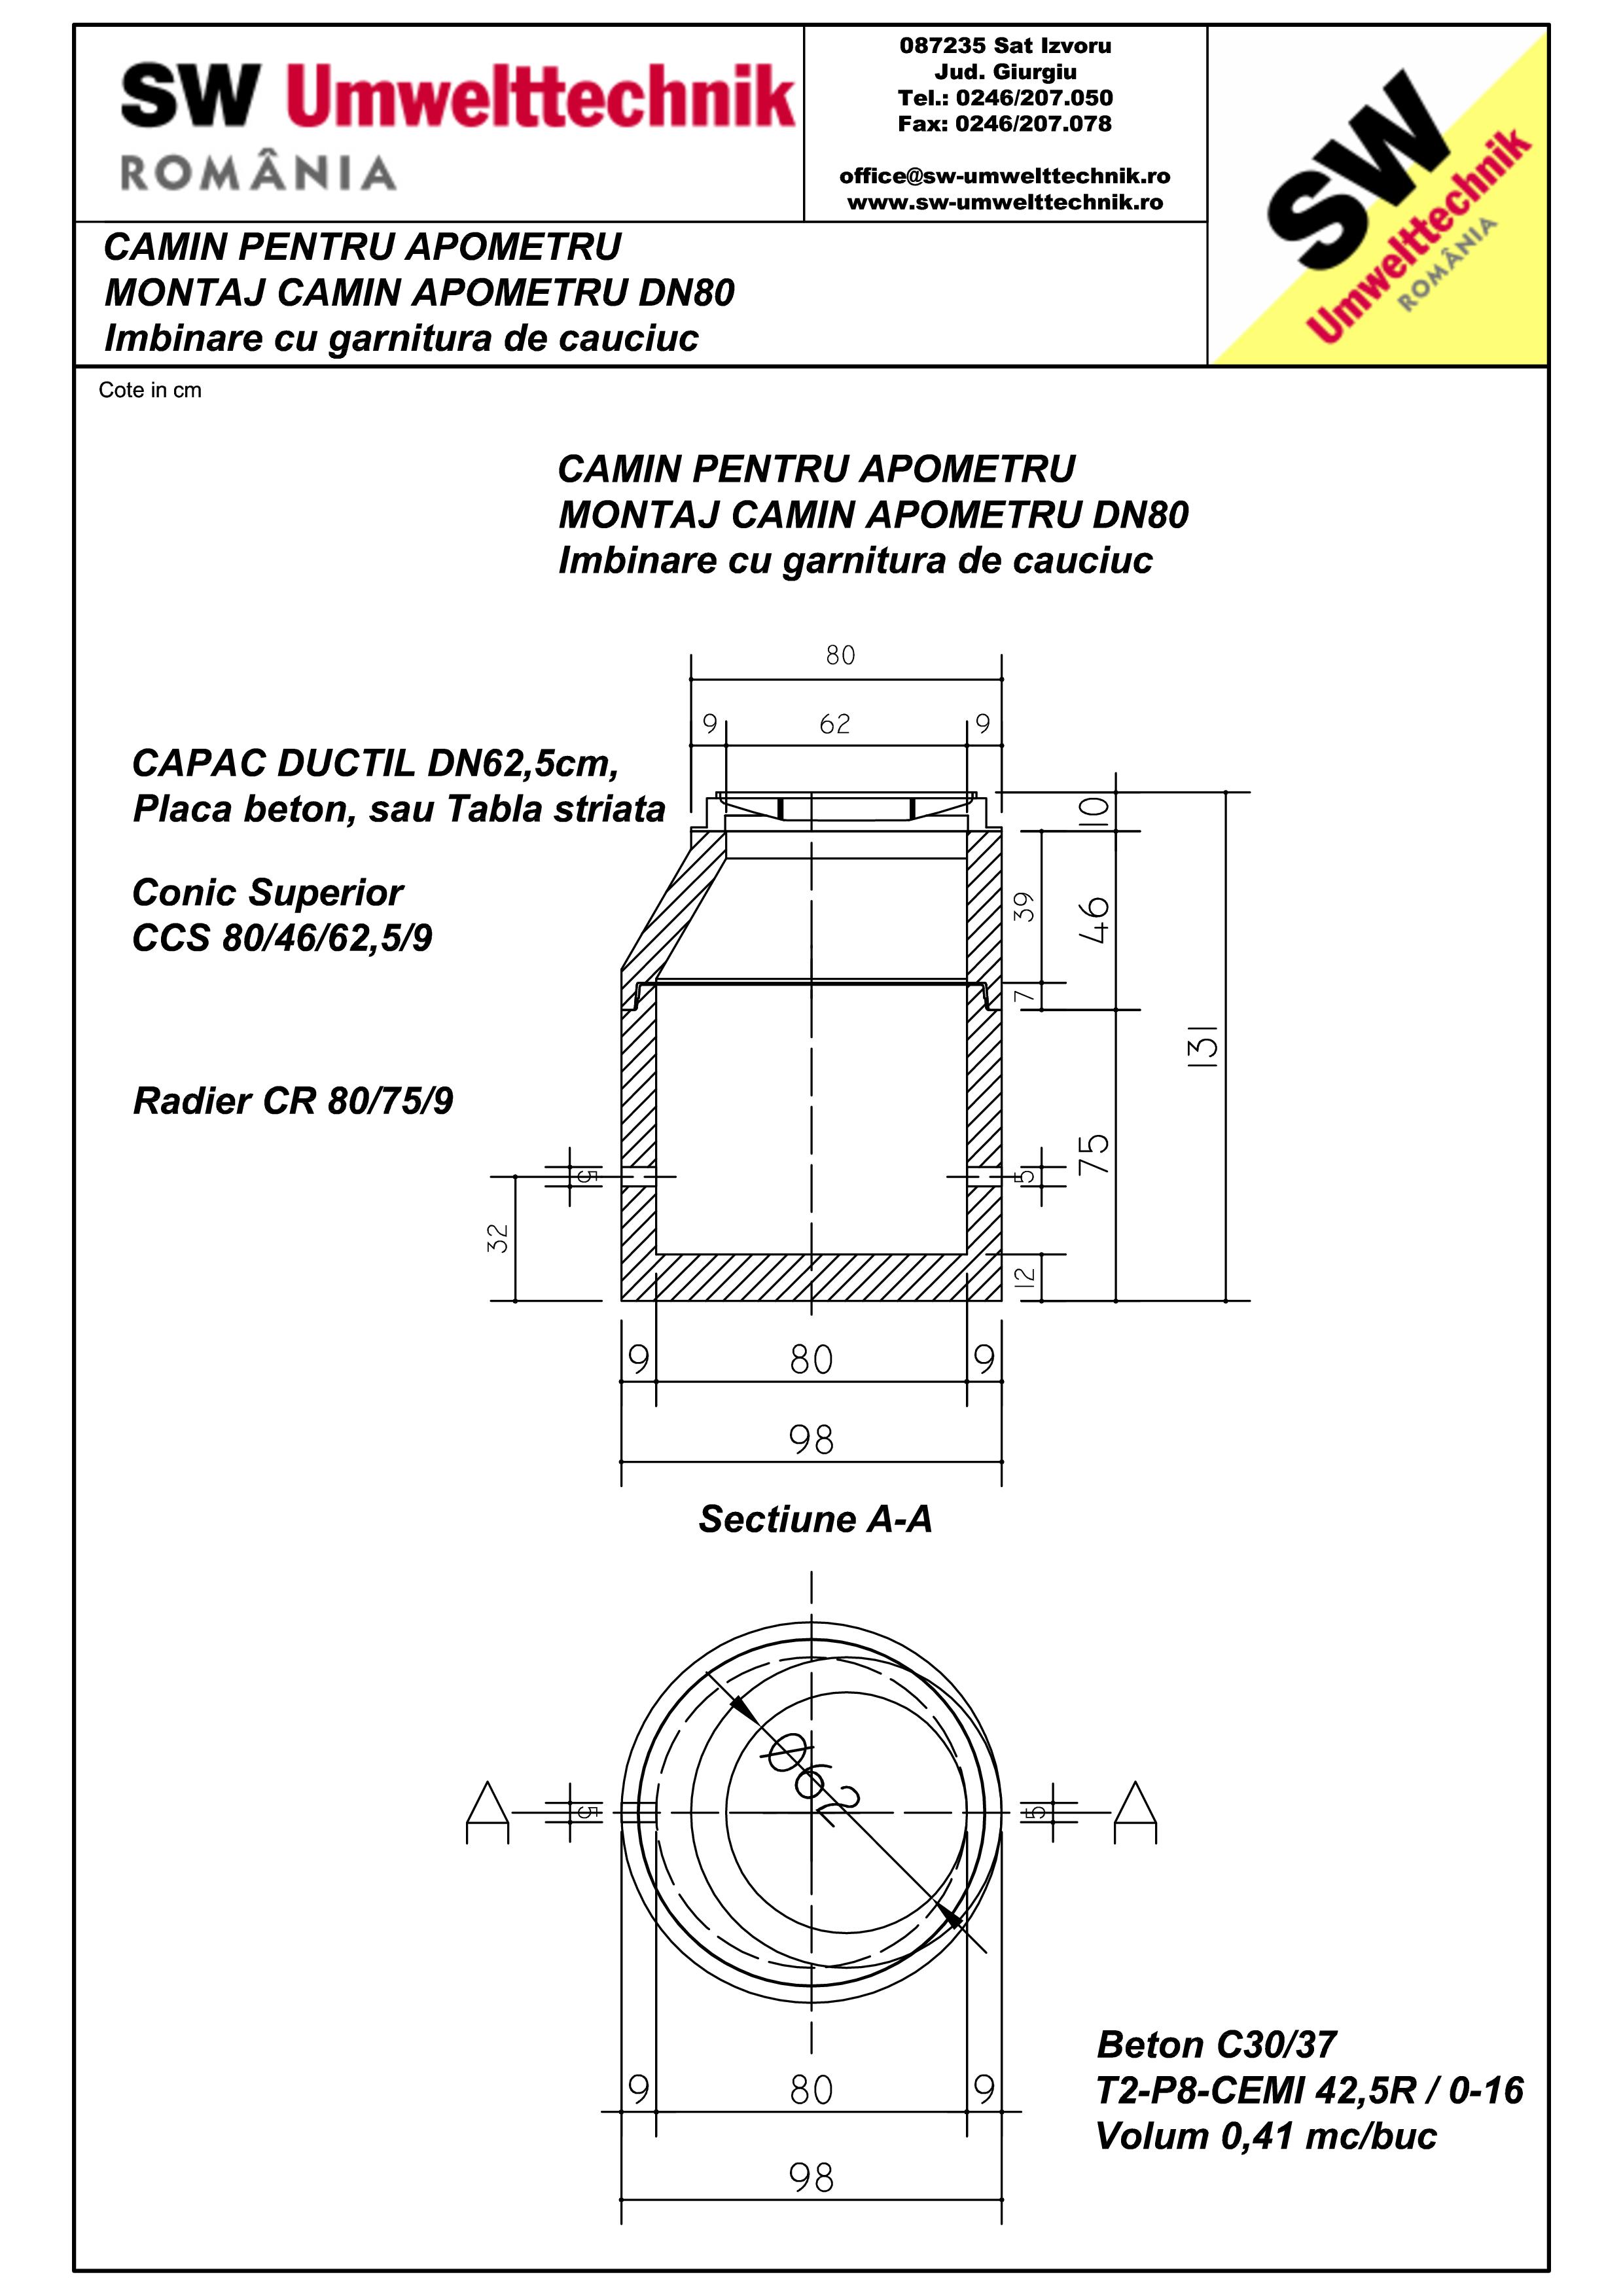 Pagina 1 - CAD-PDF Montaj camin apometru DN80 SW UMWELTTECHNIK Detaliu de produs